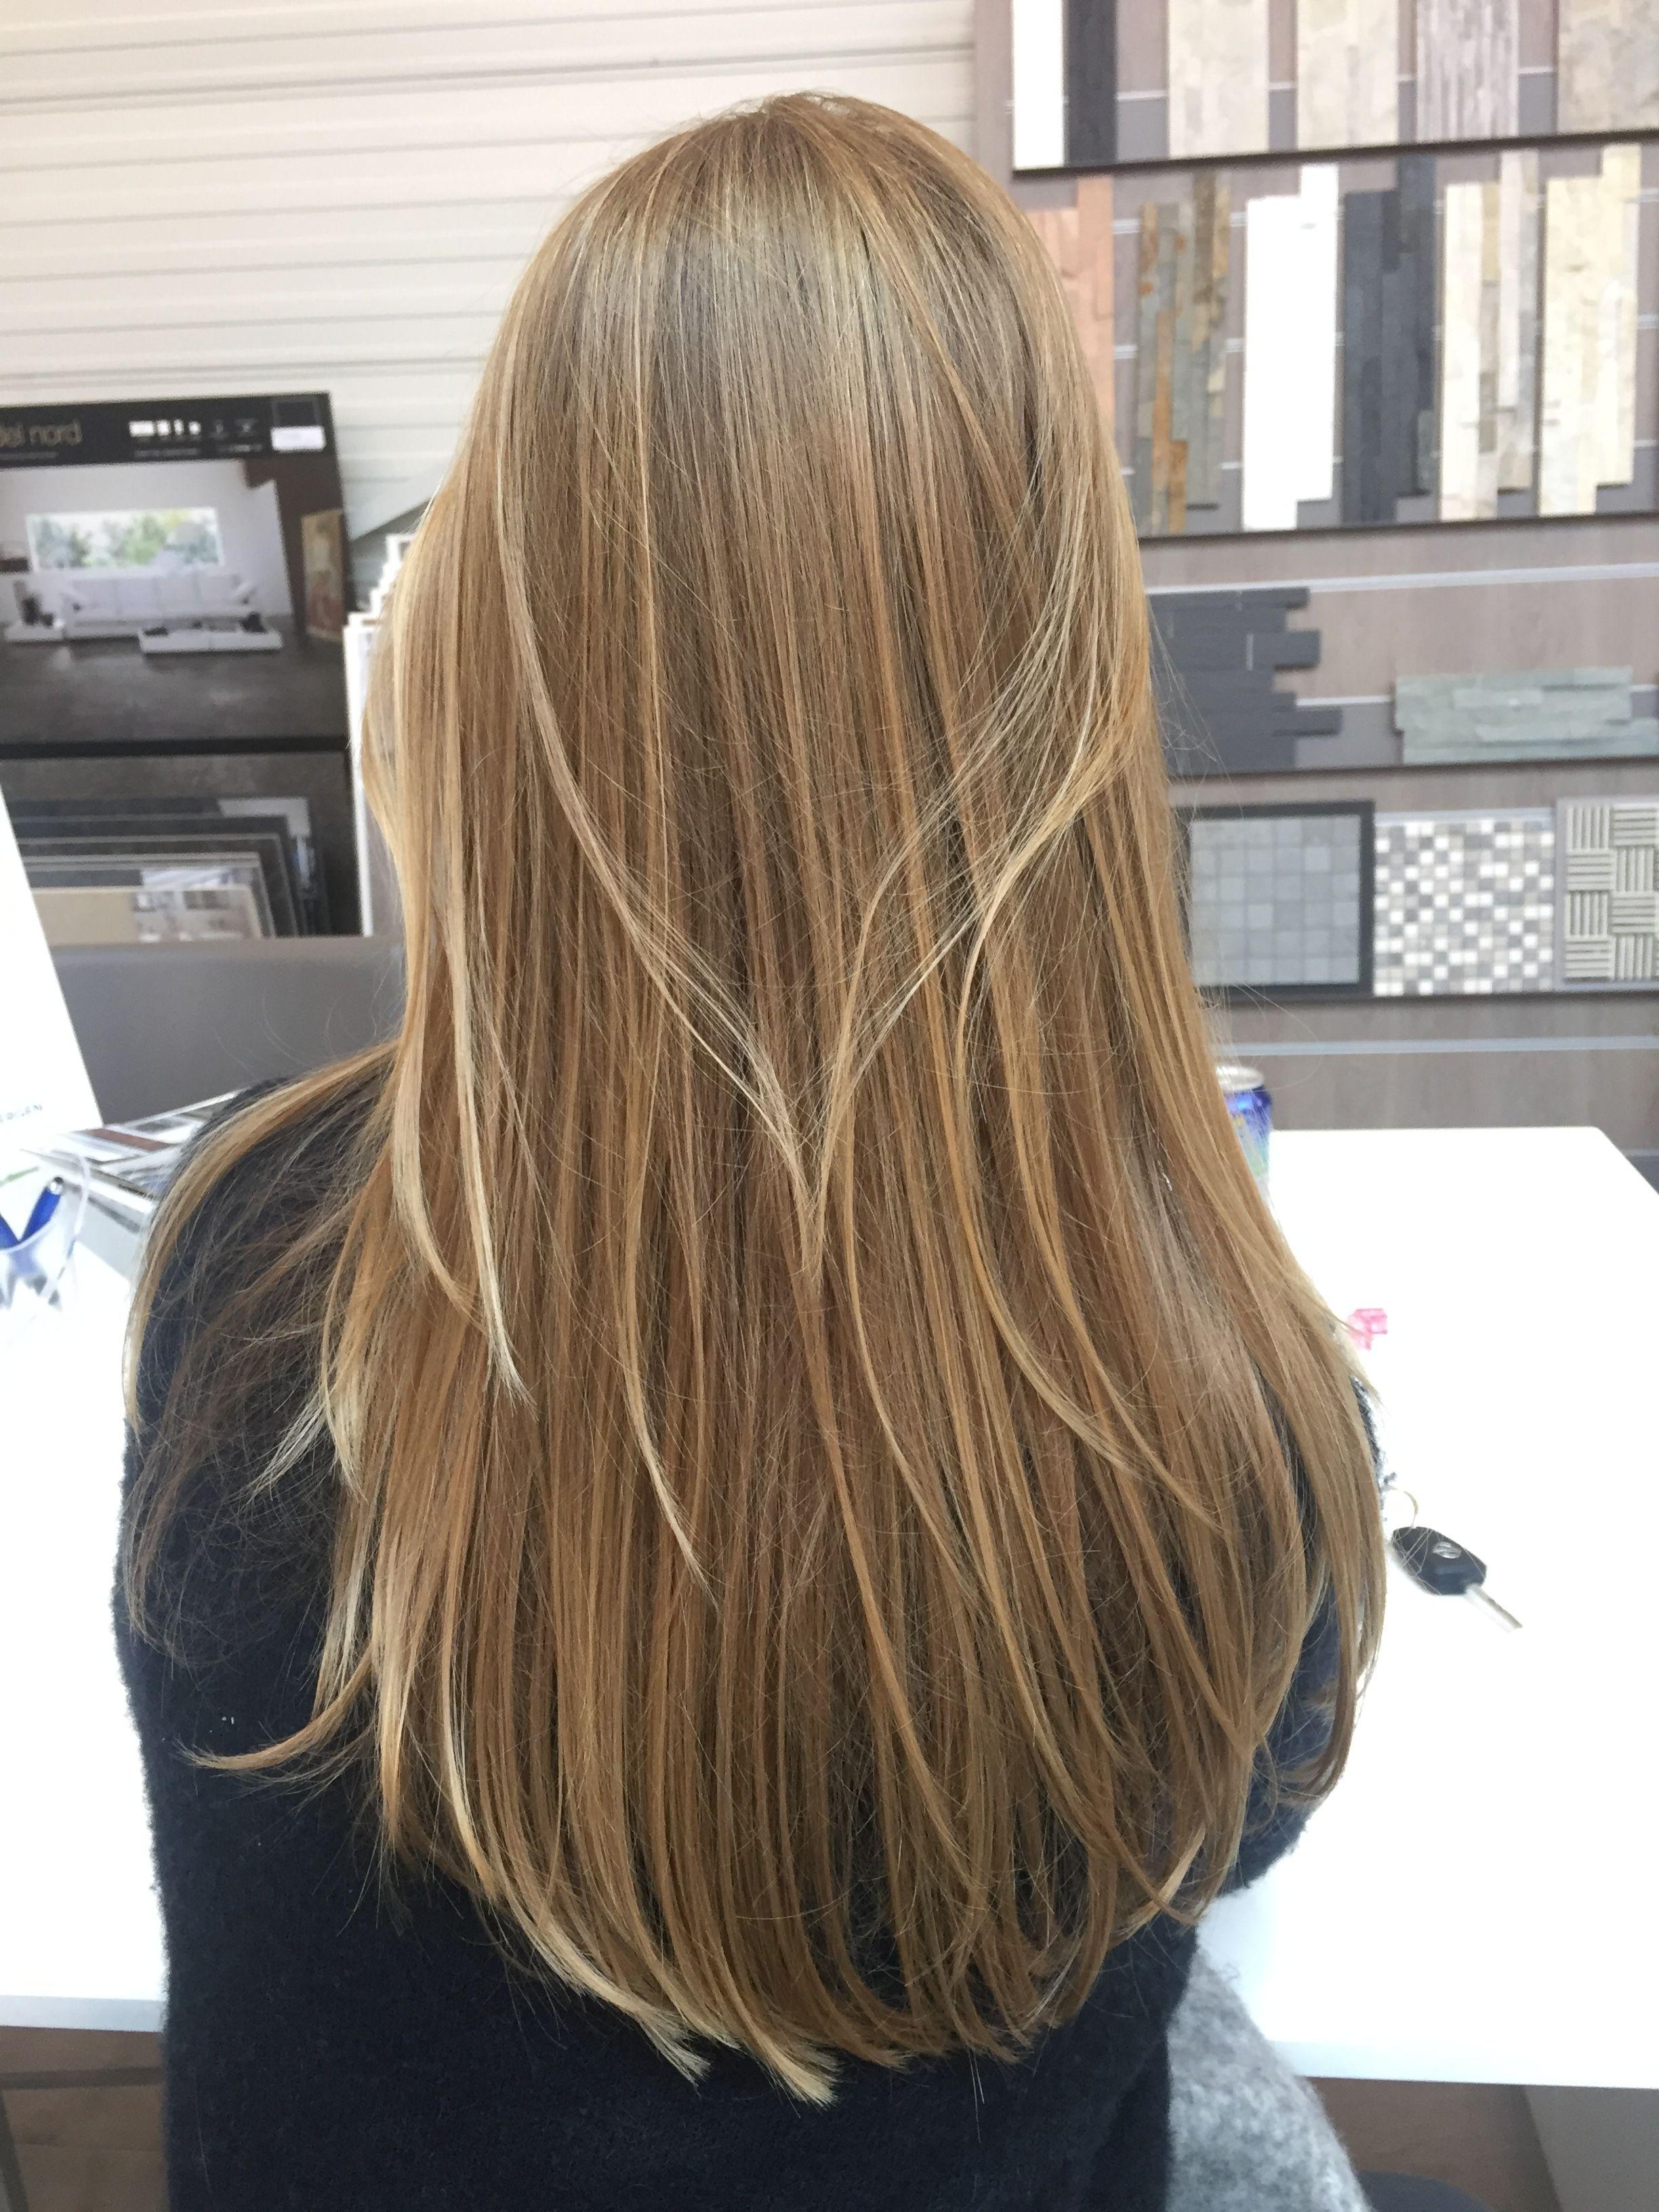 highlights #blonde #hair #brunette #pretty #cute #hairstyle